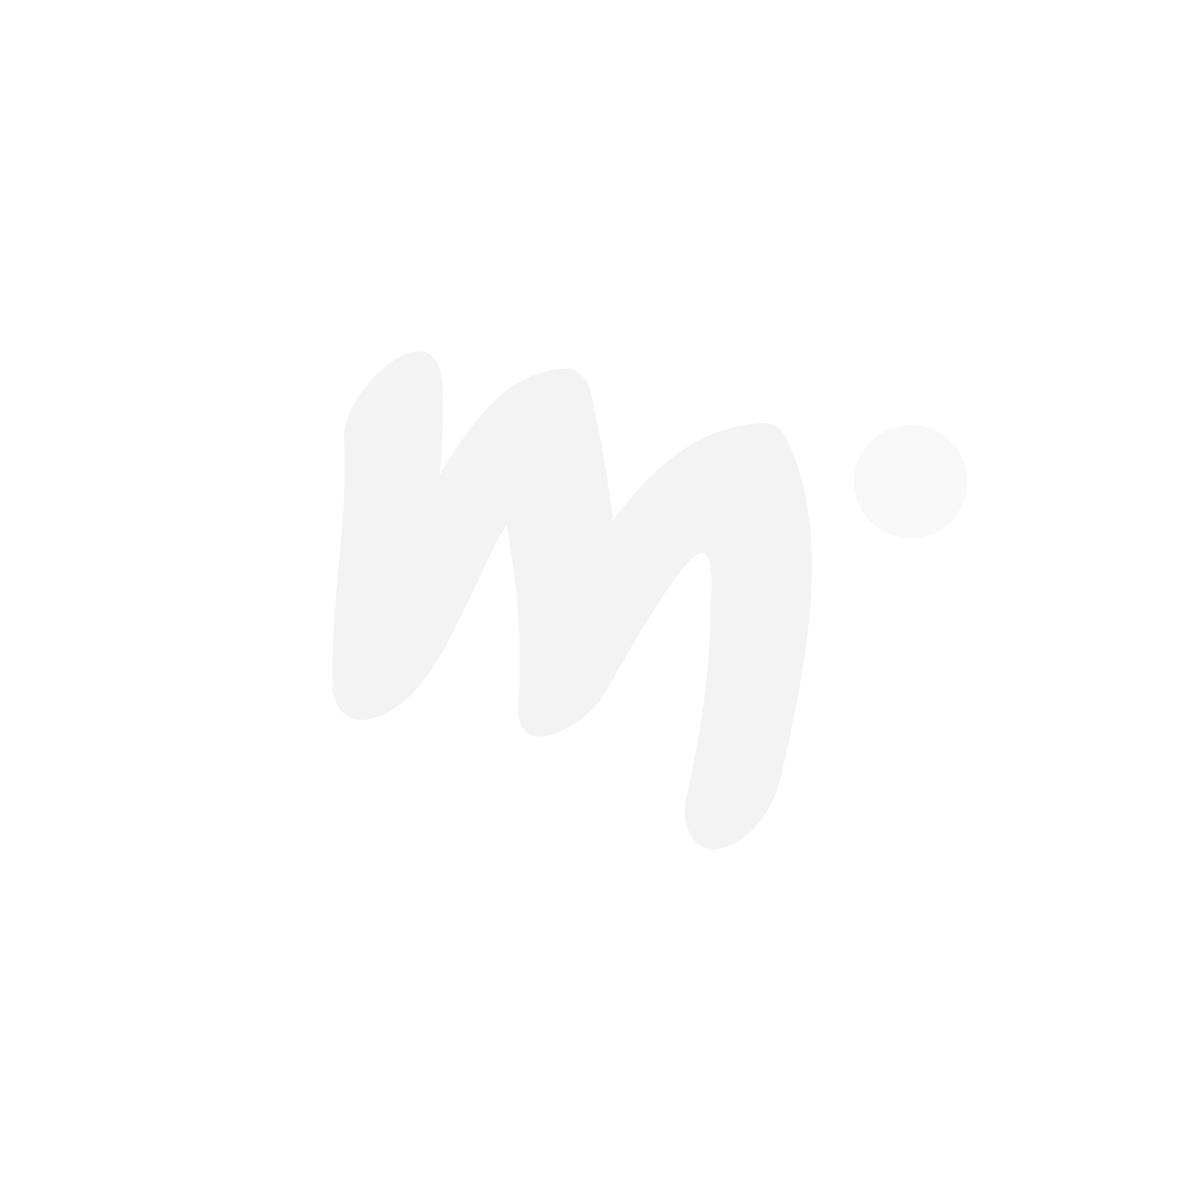 Moomin Animation Special Coffee Jar Midwinter